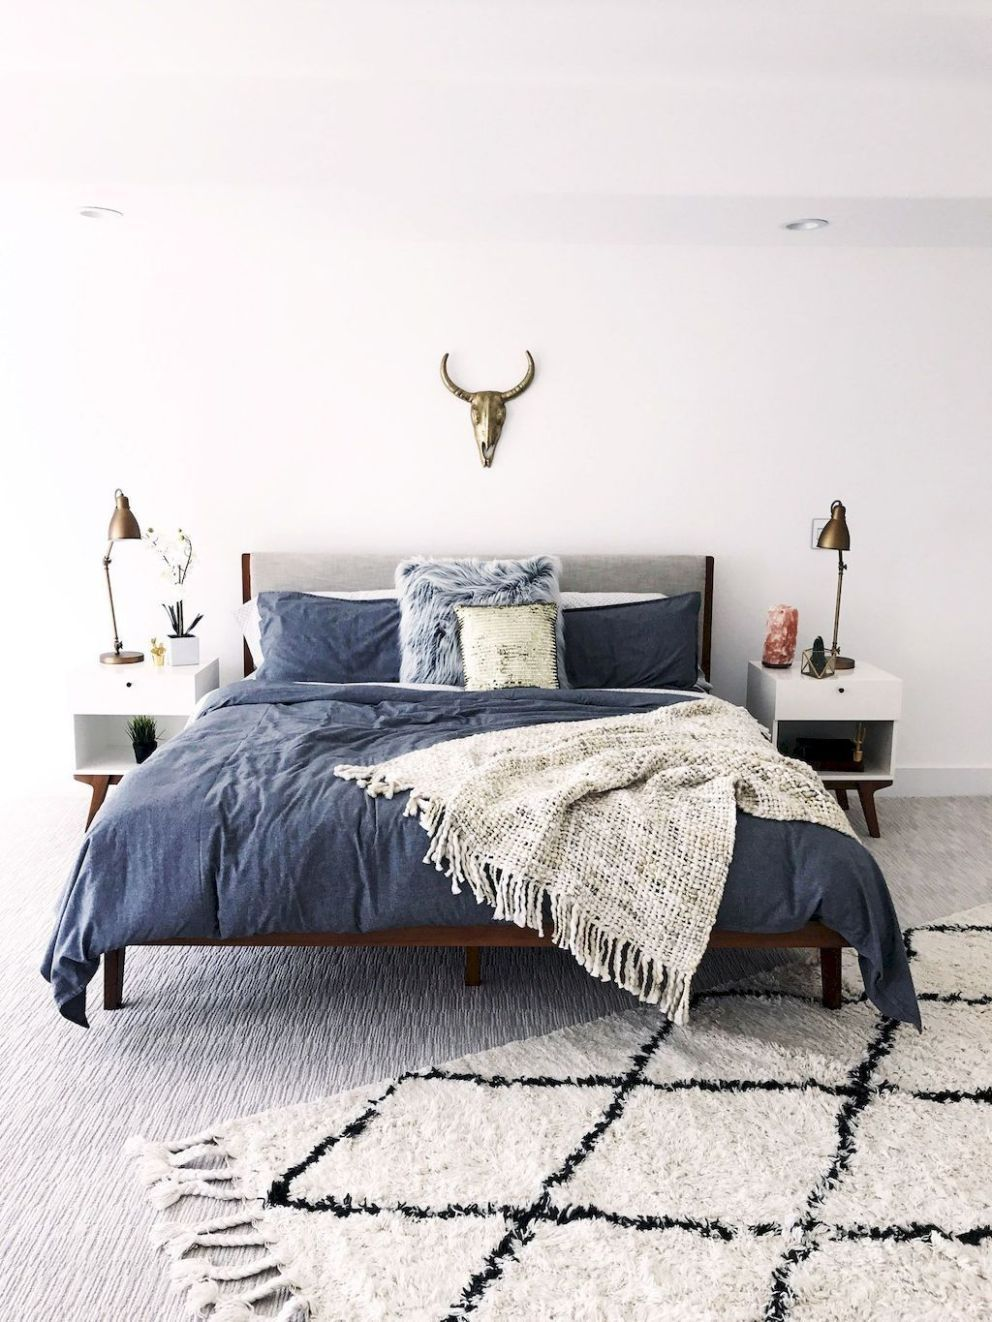 25 Elegant Mid Century Modern Bedroom (Heaven-Like Rooms) - 23